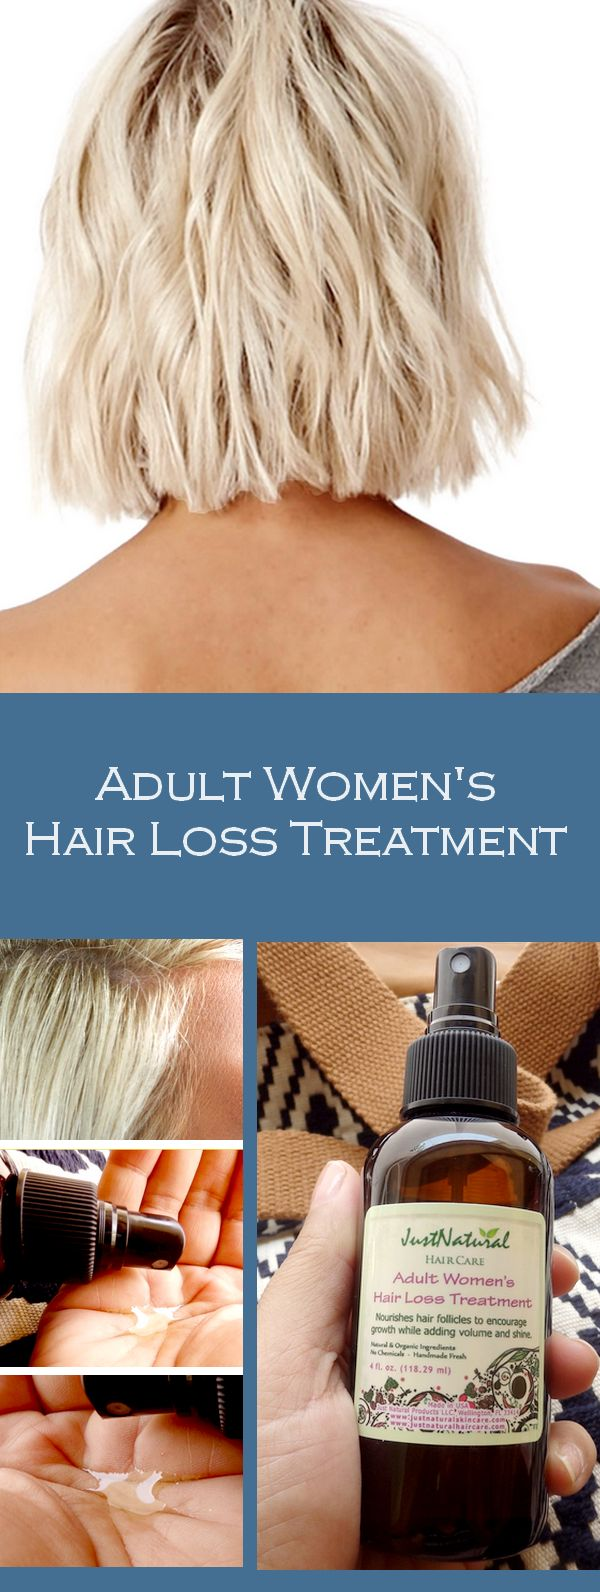 Help — I'm Losing My Hair! - Diabetes Self-Management